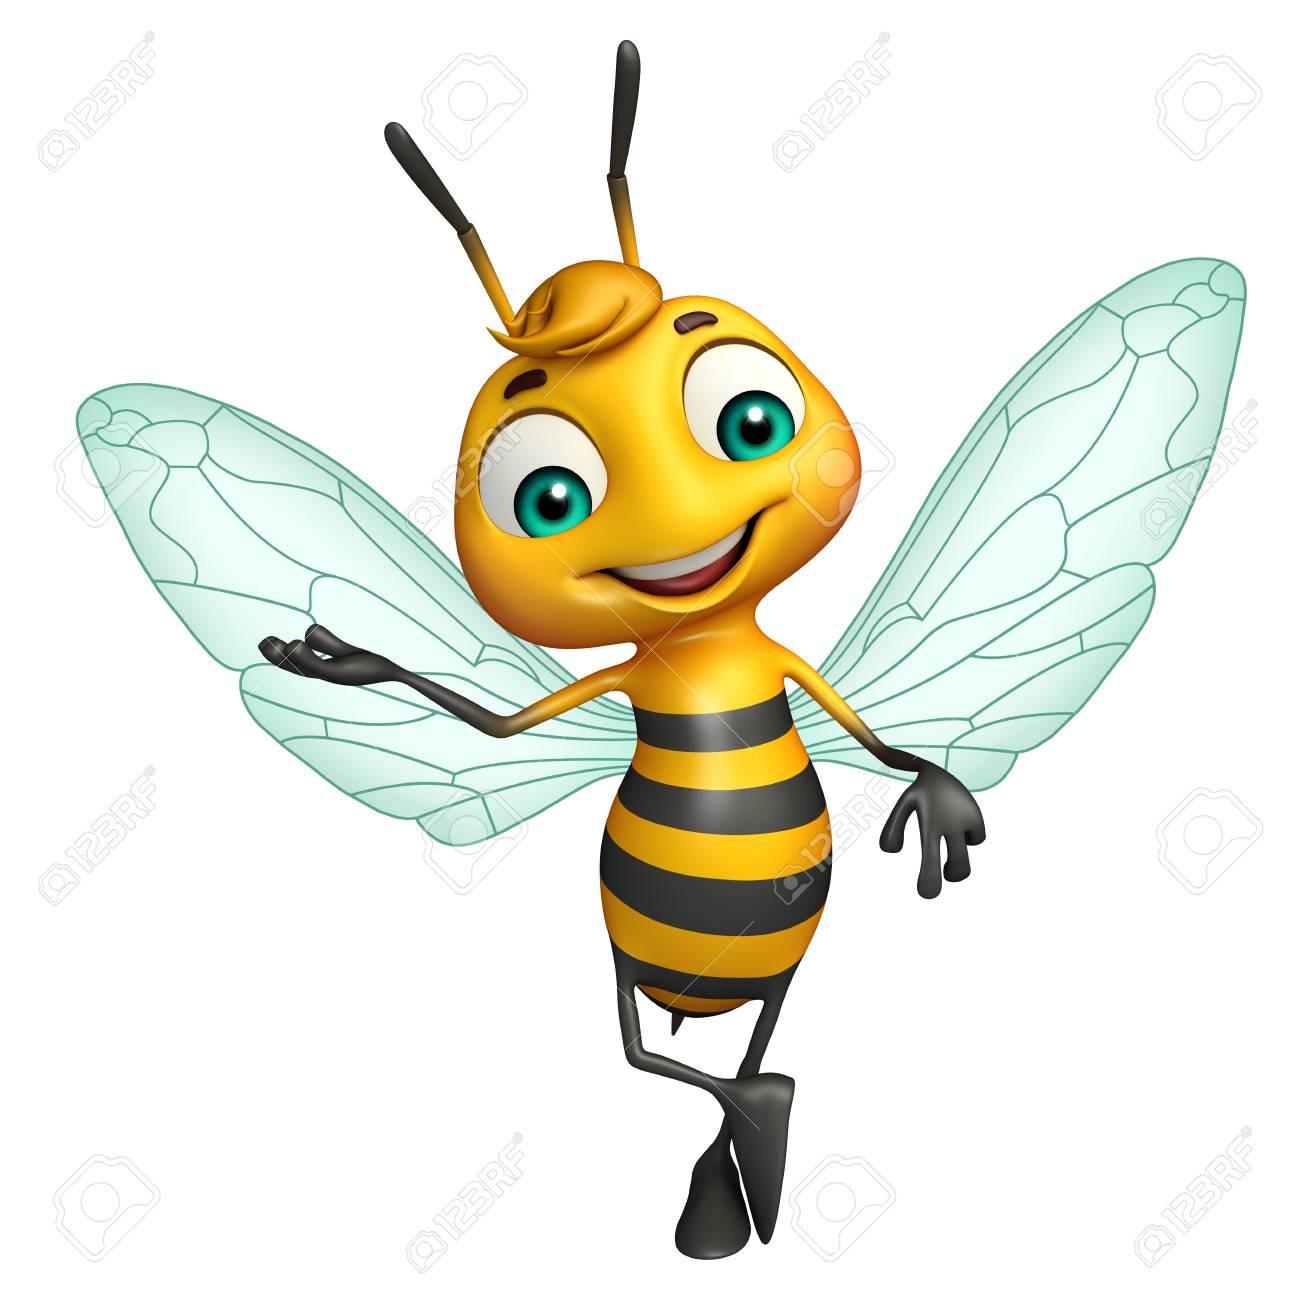 62895b15f 3d rendered illustration of Bee funny cartoon character Stock Illustration  - 53095365